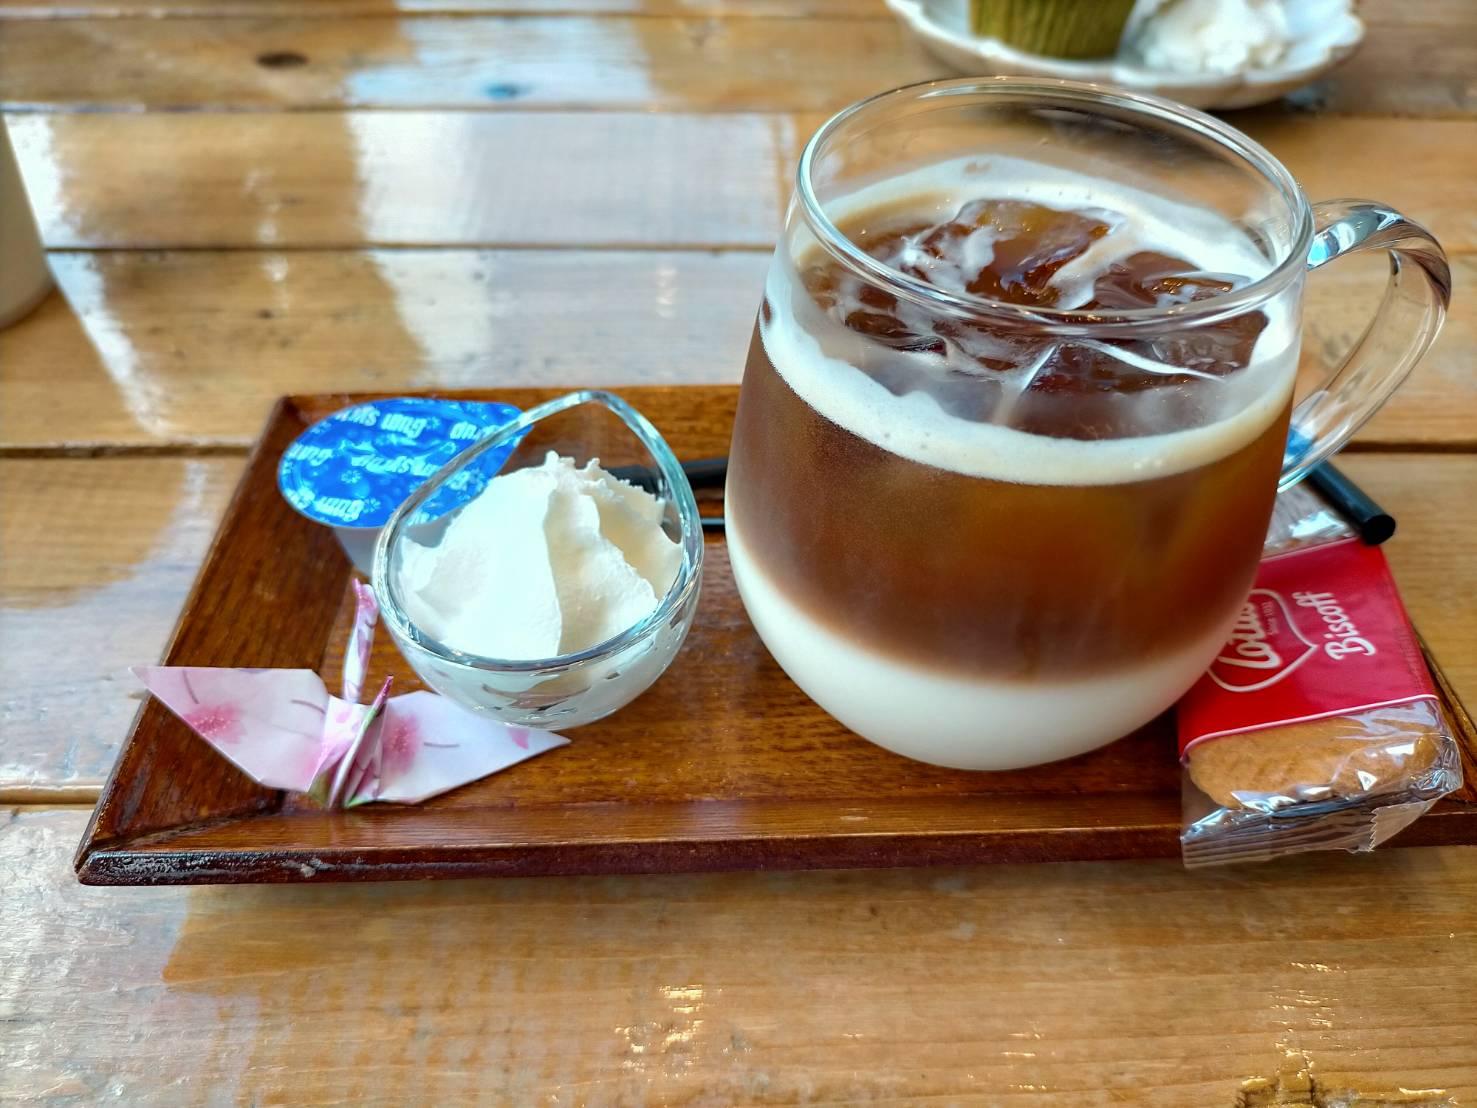 Lake-Side-Cafe-Ku-2 山梨県